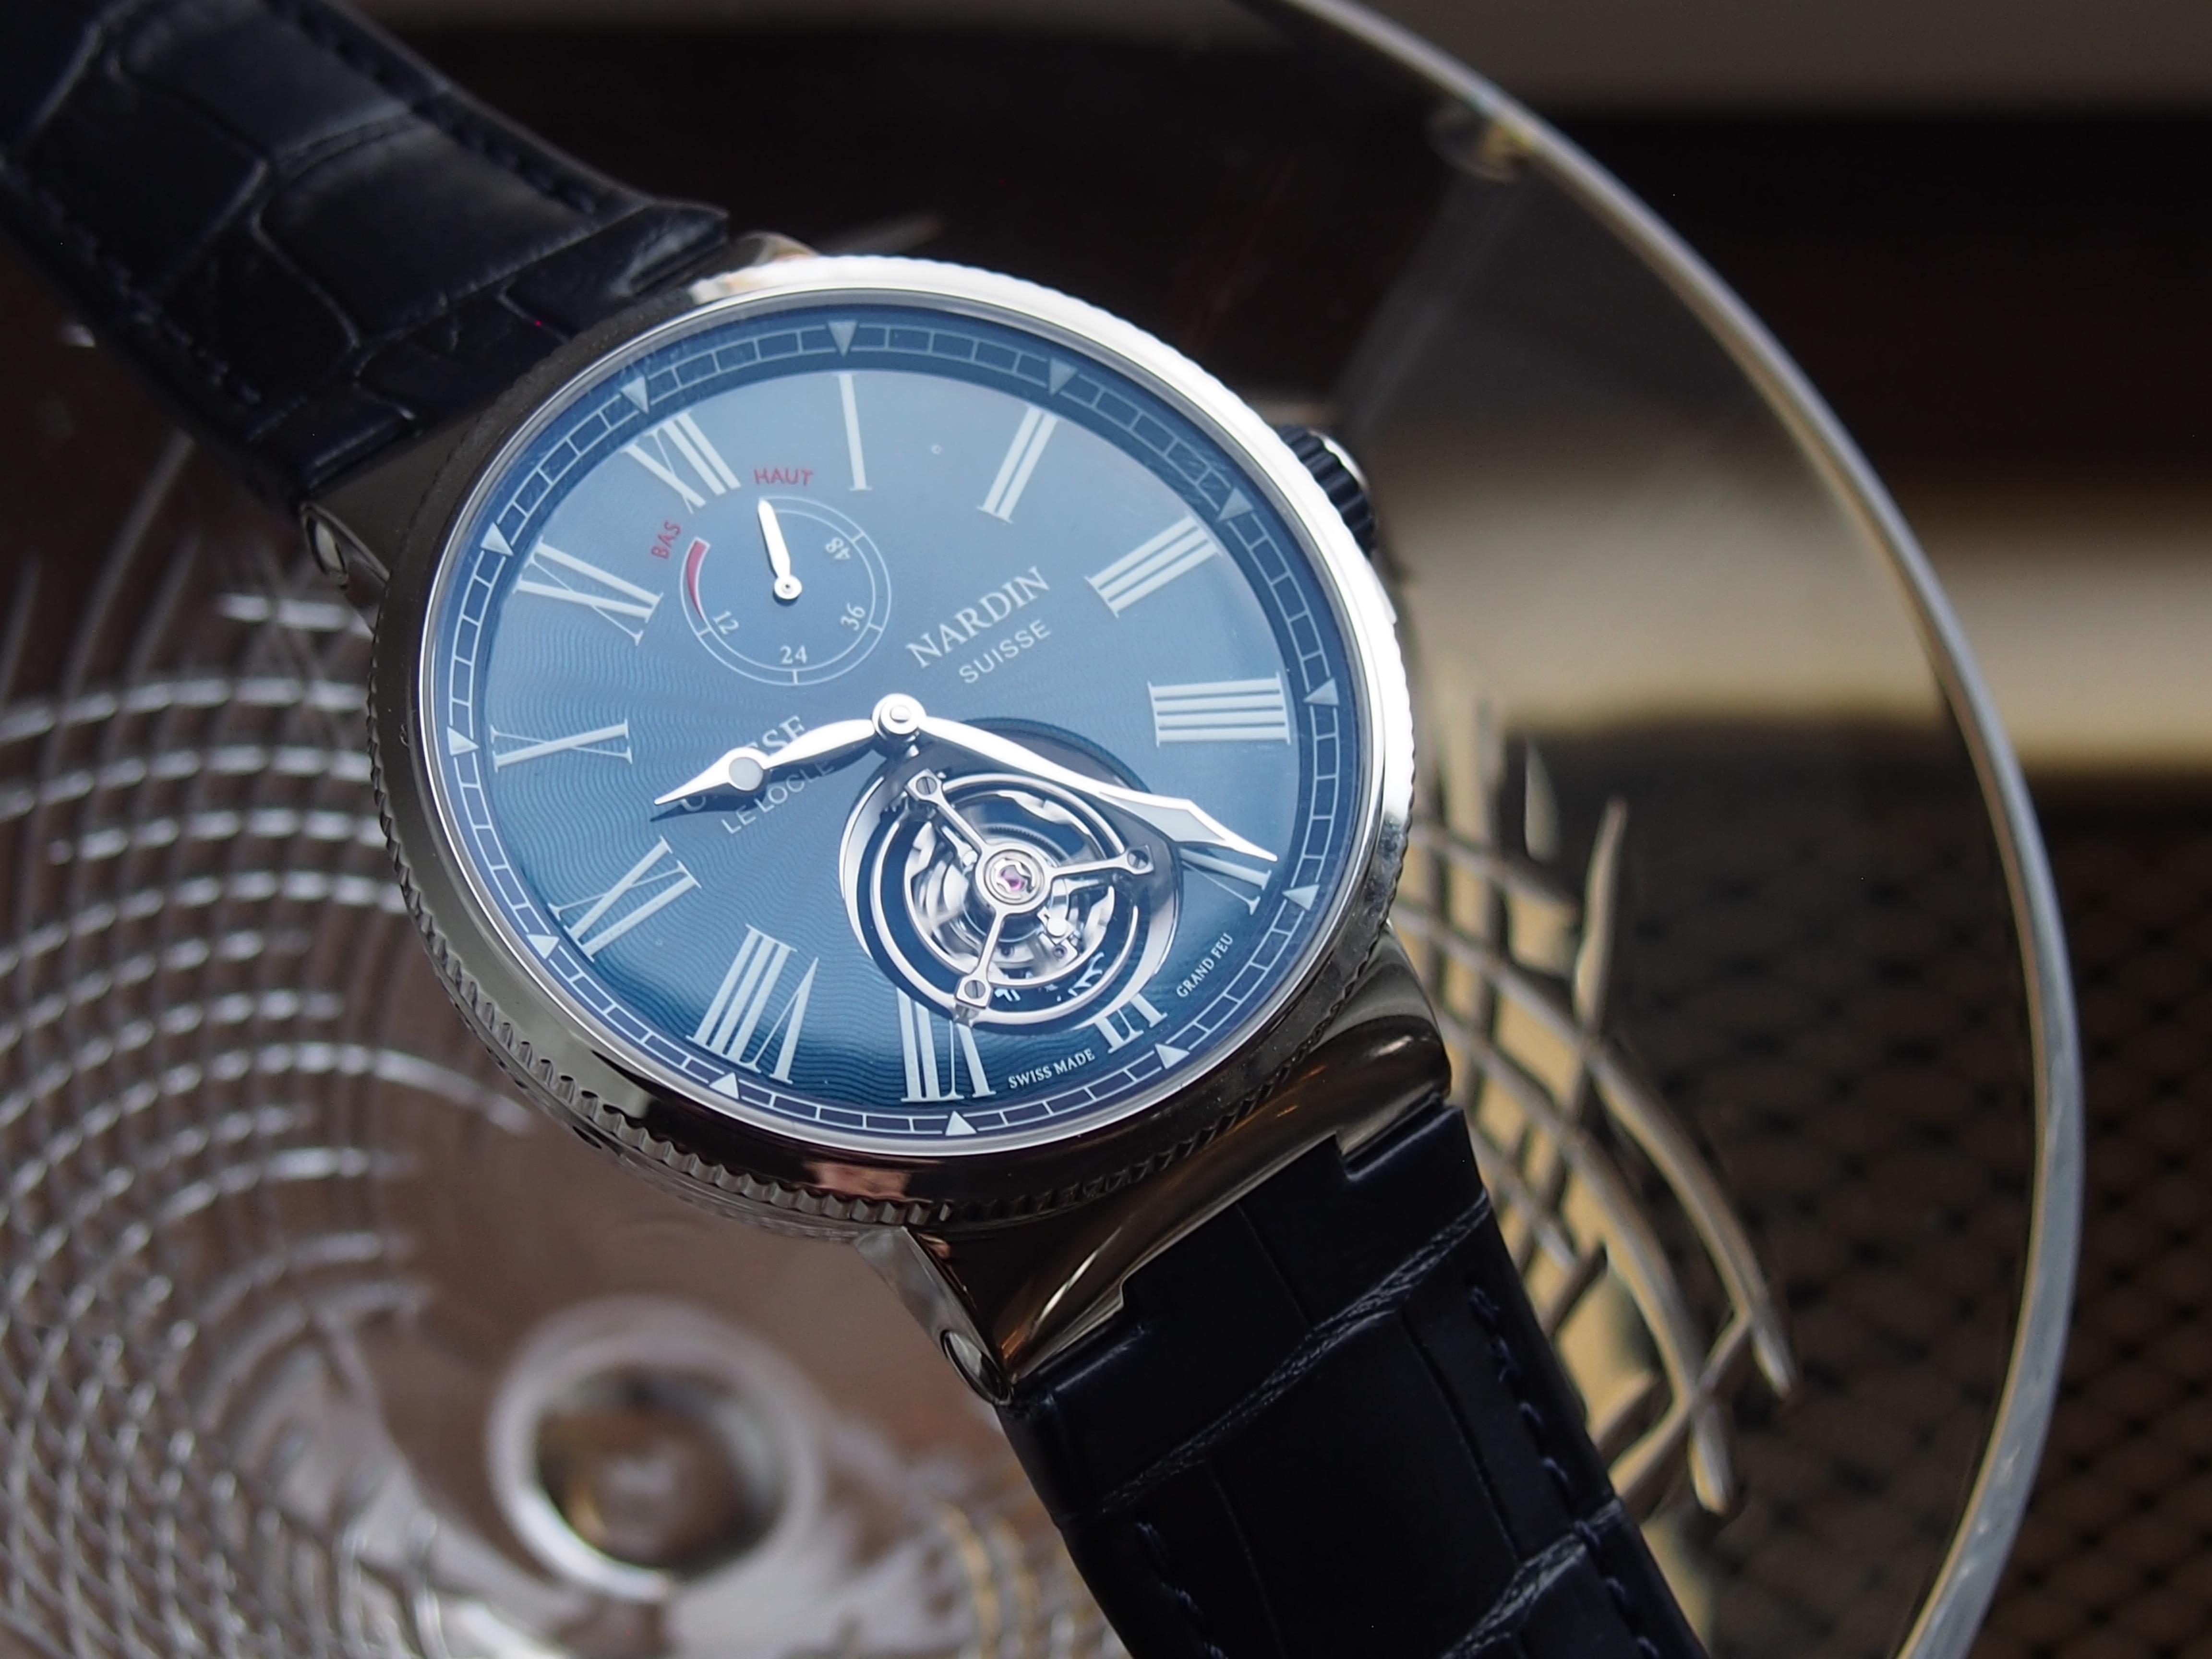 The Ulysse Nardin Marine Tourbillon Blue Grand Feu watch carries an amazing price point for a tourbillon.